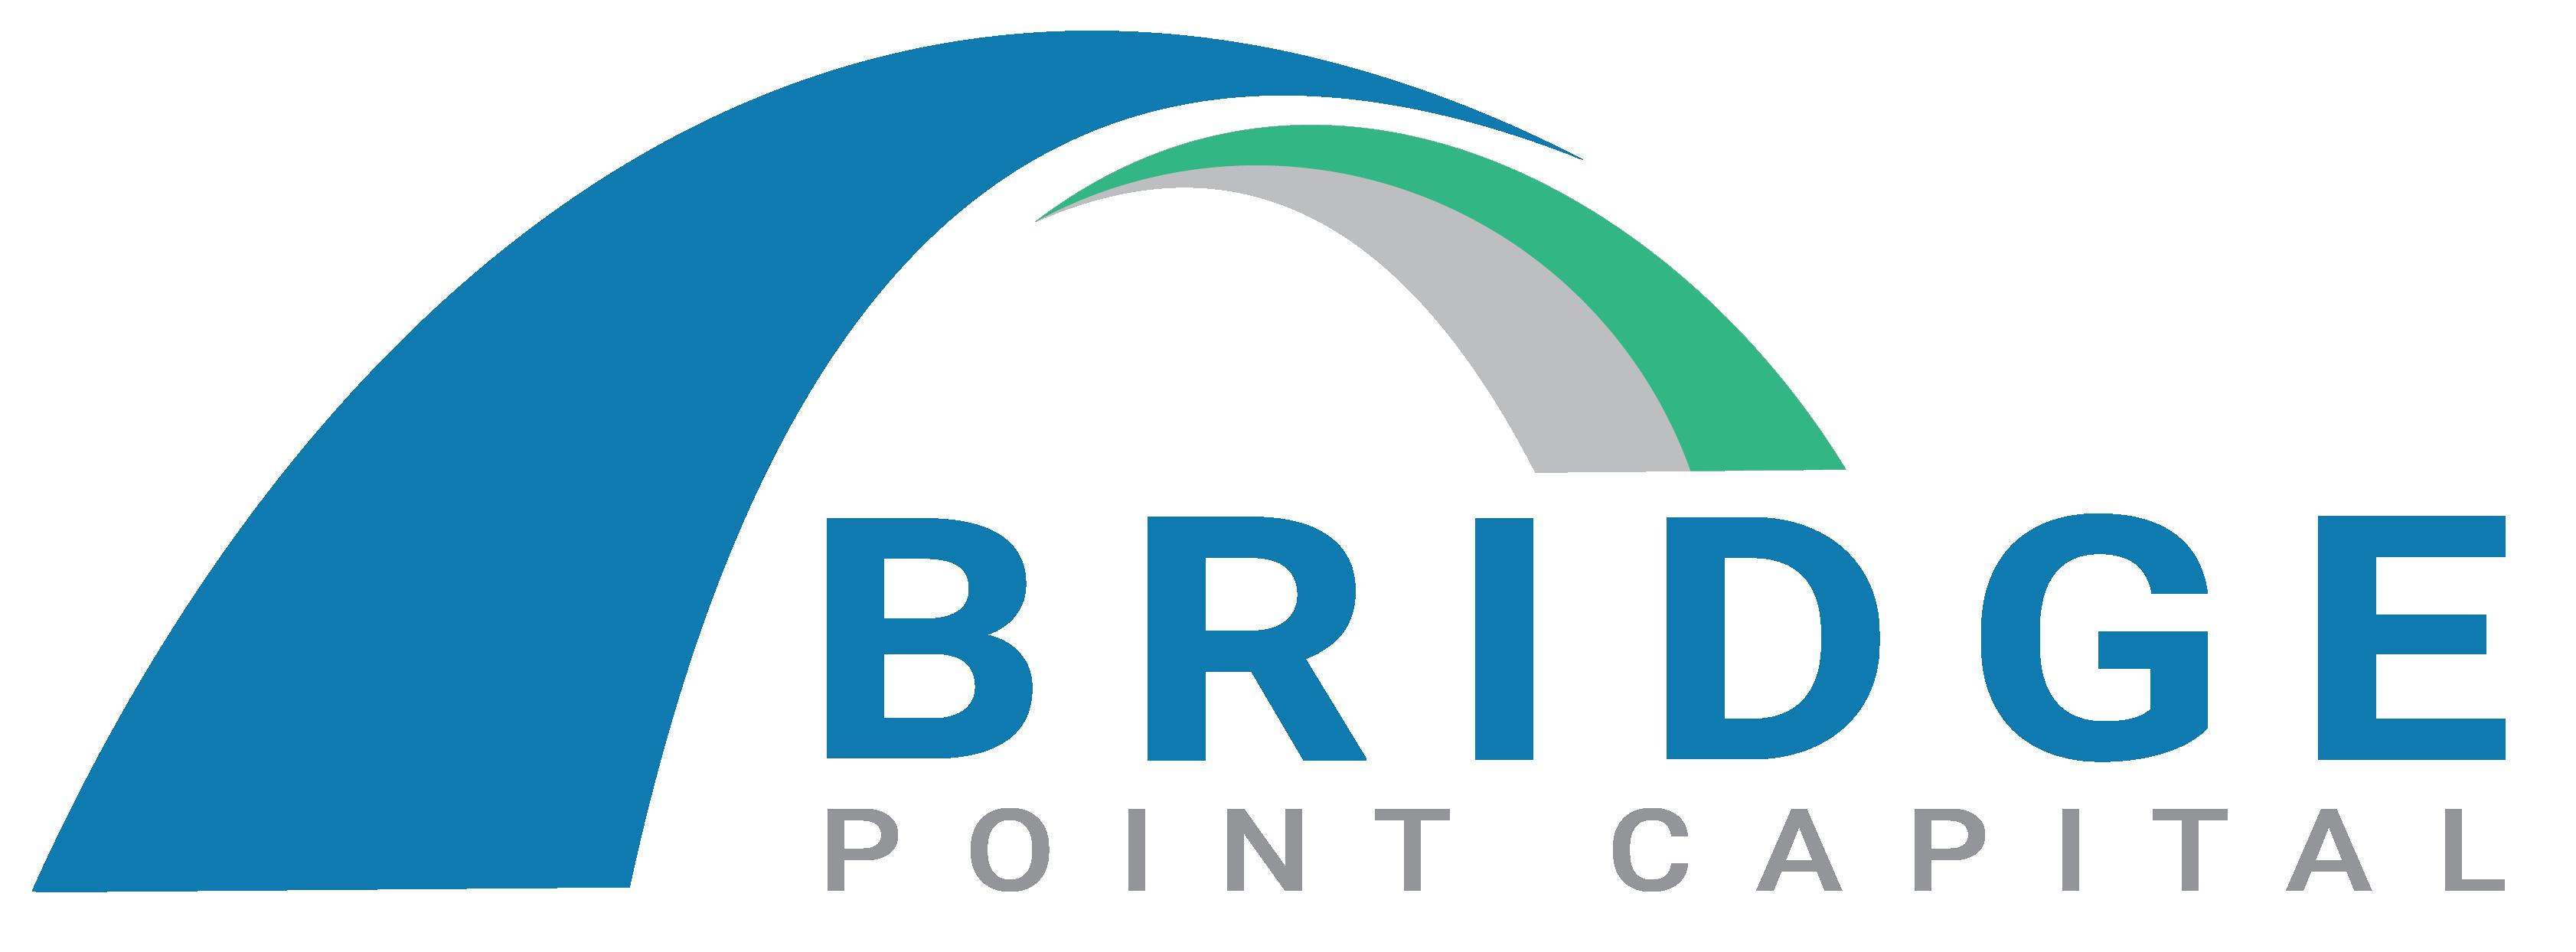 Bridge Point Capital.